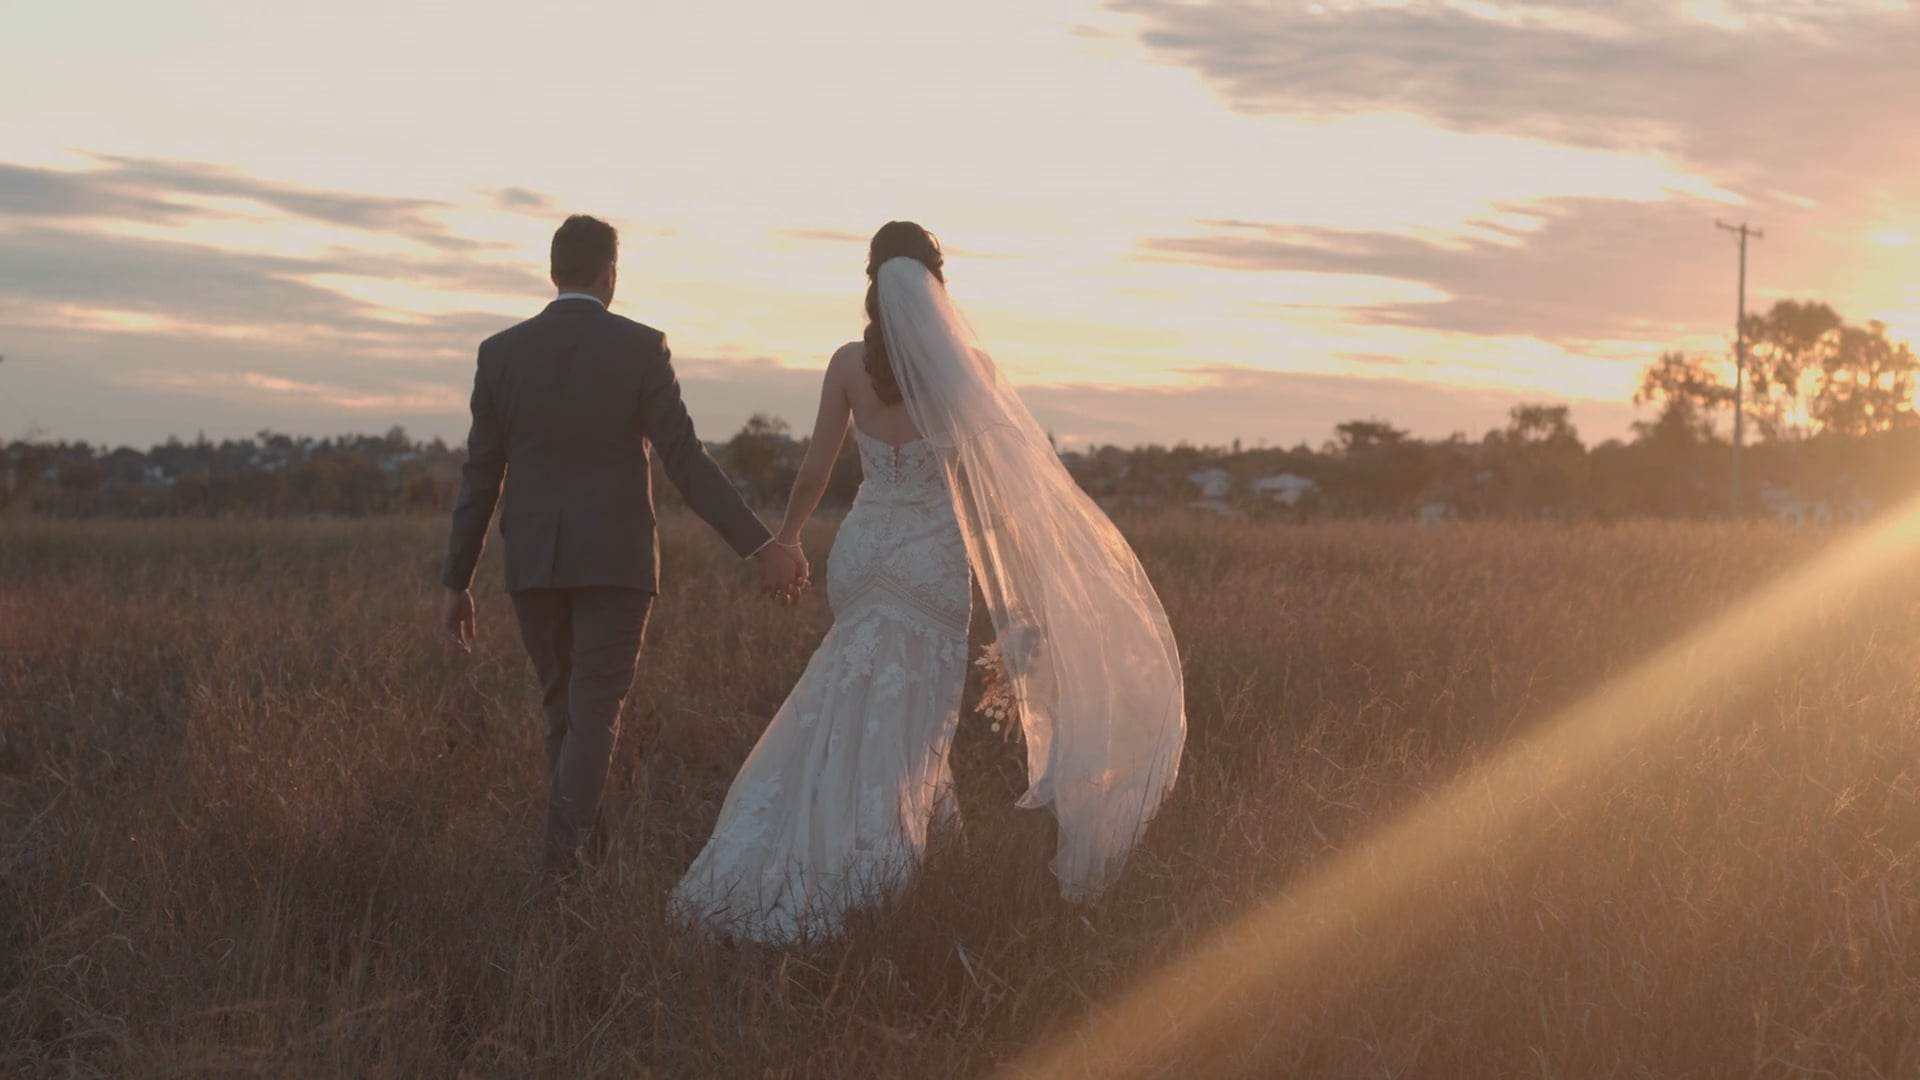 SHAYE & GERARD - WEDDING TEASER 4K